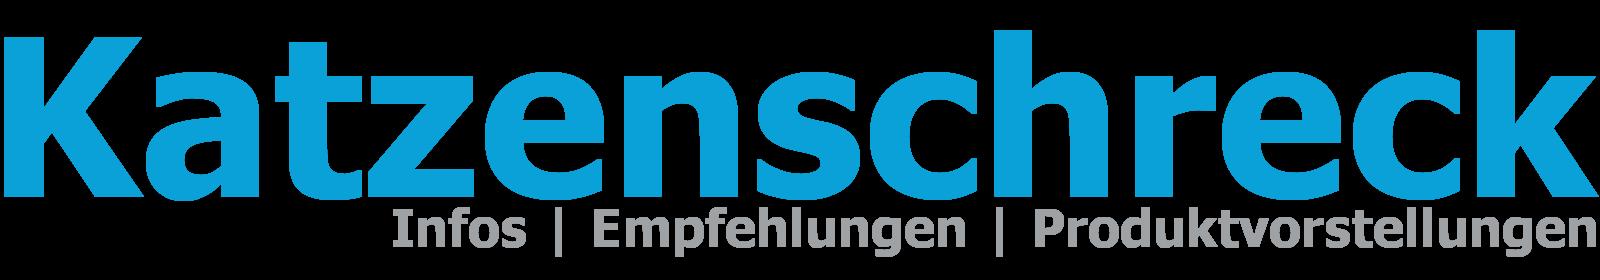 Katzenschreck-info Logo